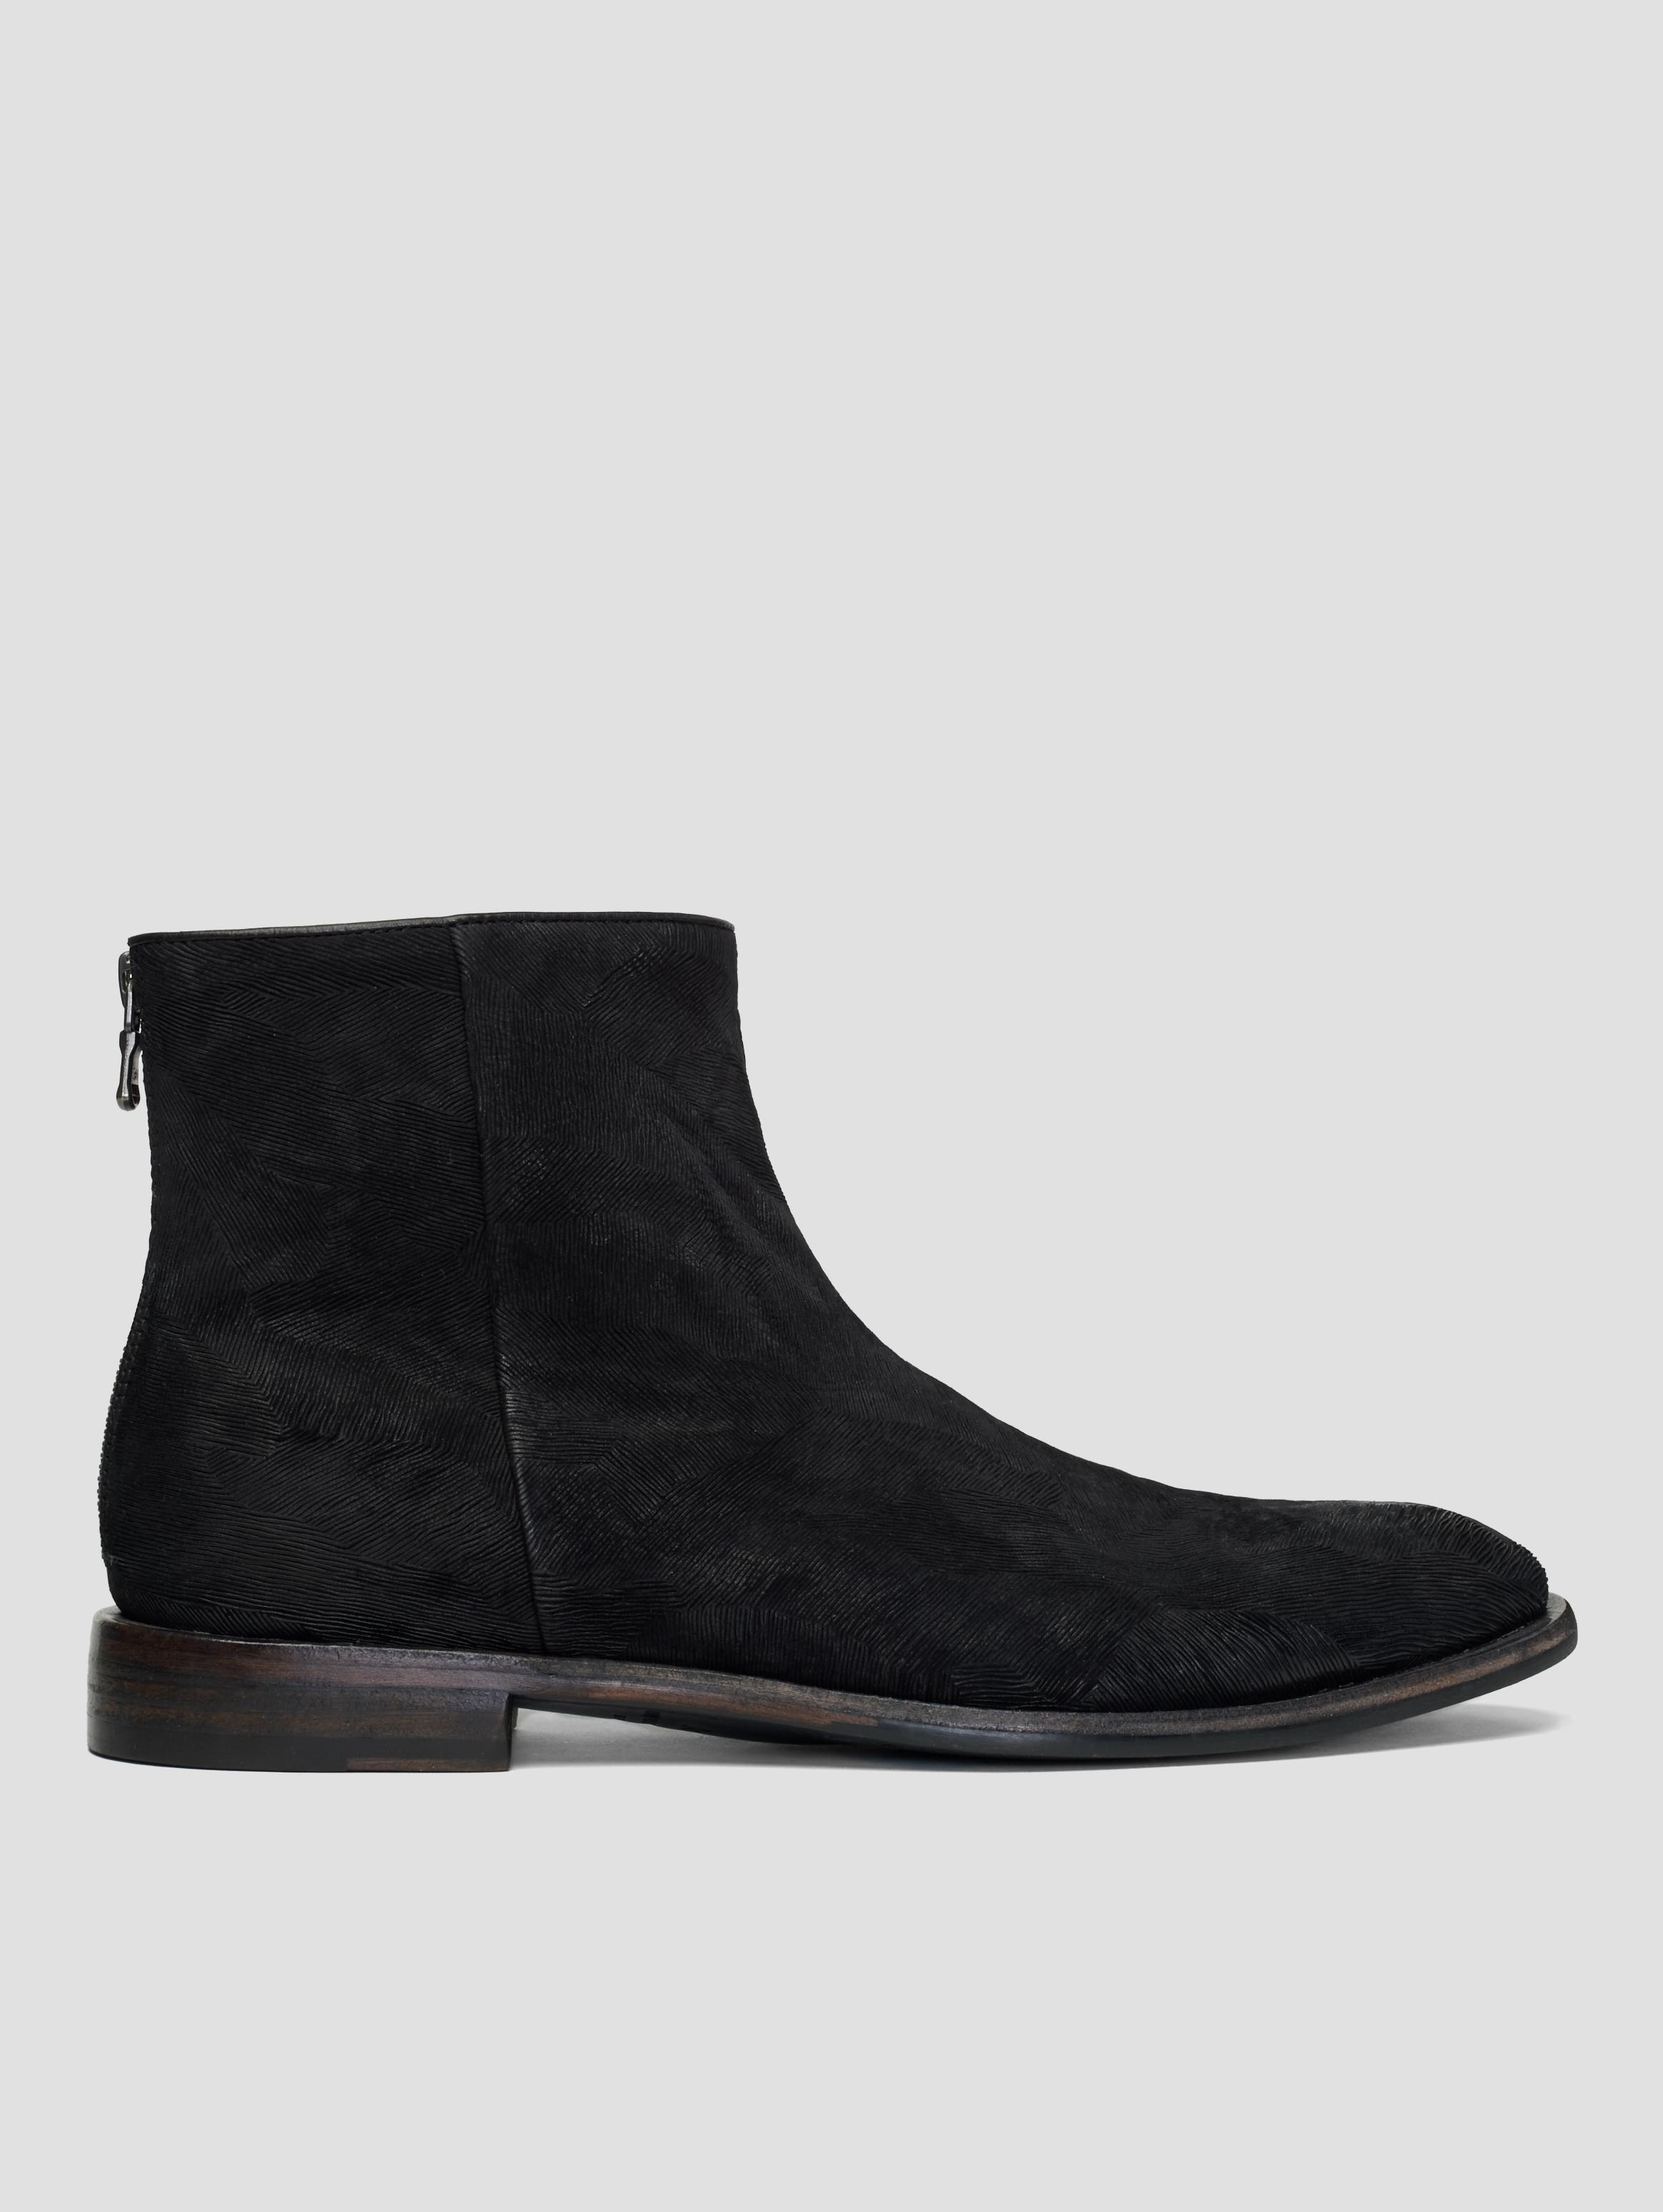 John Varvatos Nyc Back Zip Boots Black